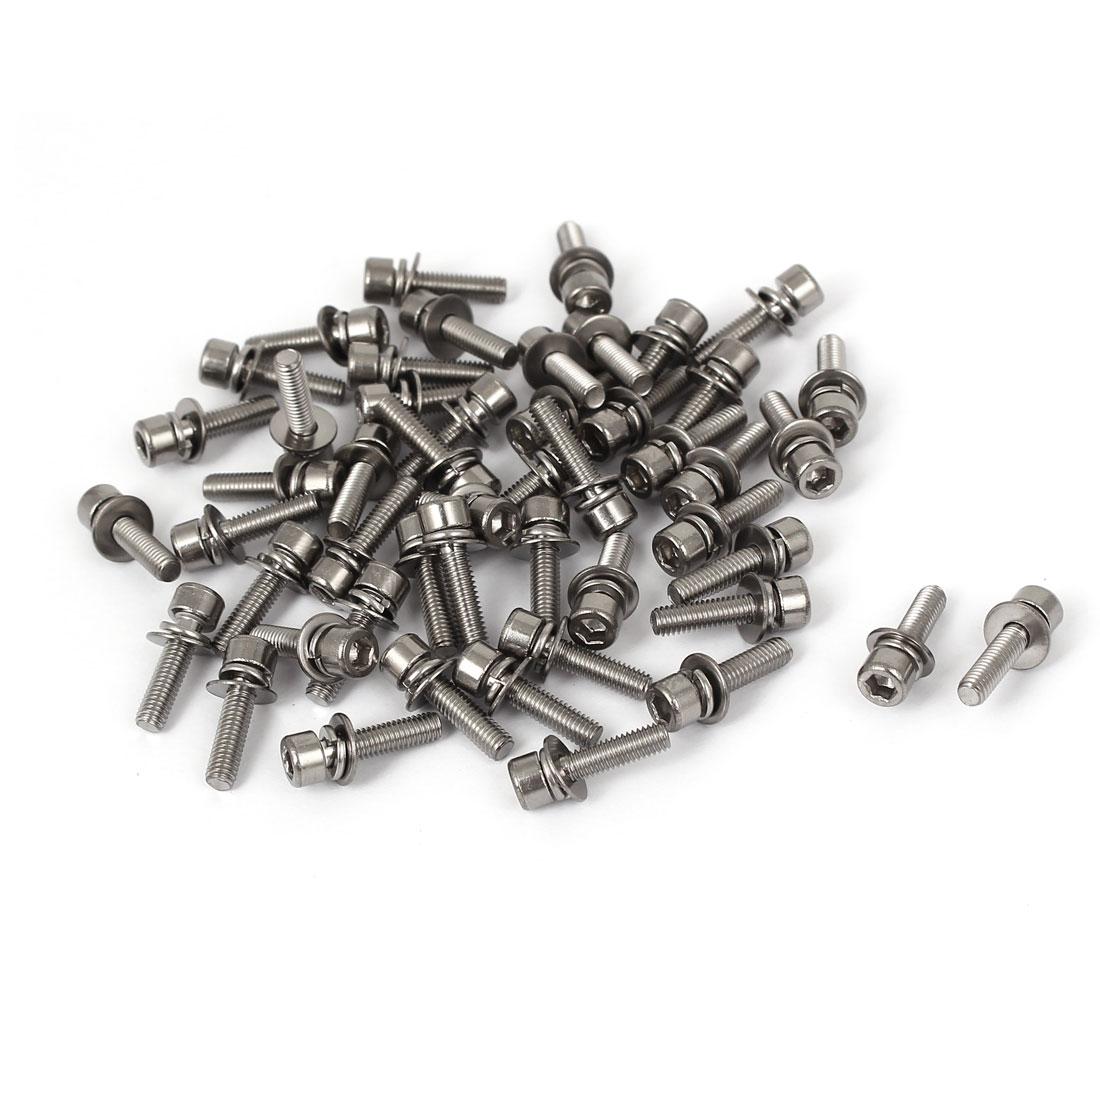 15mm Length M3 x 12mm Thread Hex Socket Head Cap Screw w Washer Silver Tone 50 Pcs